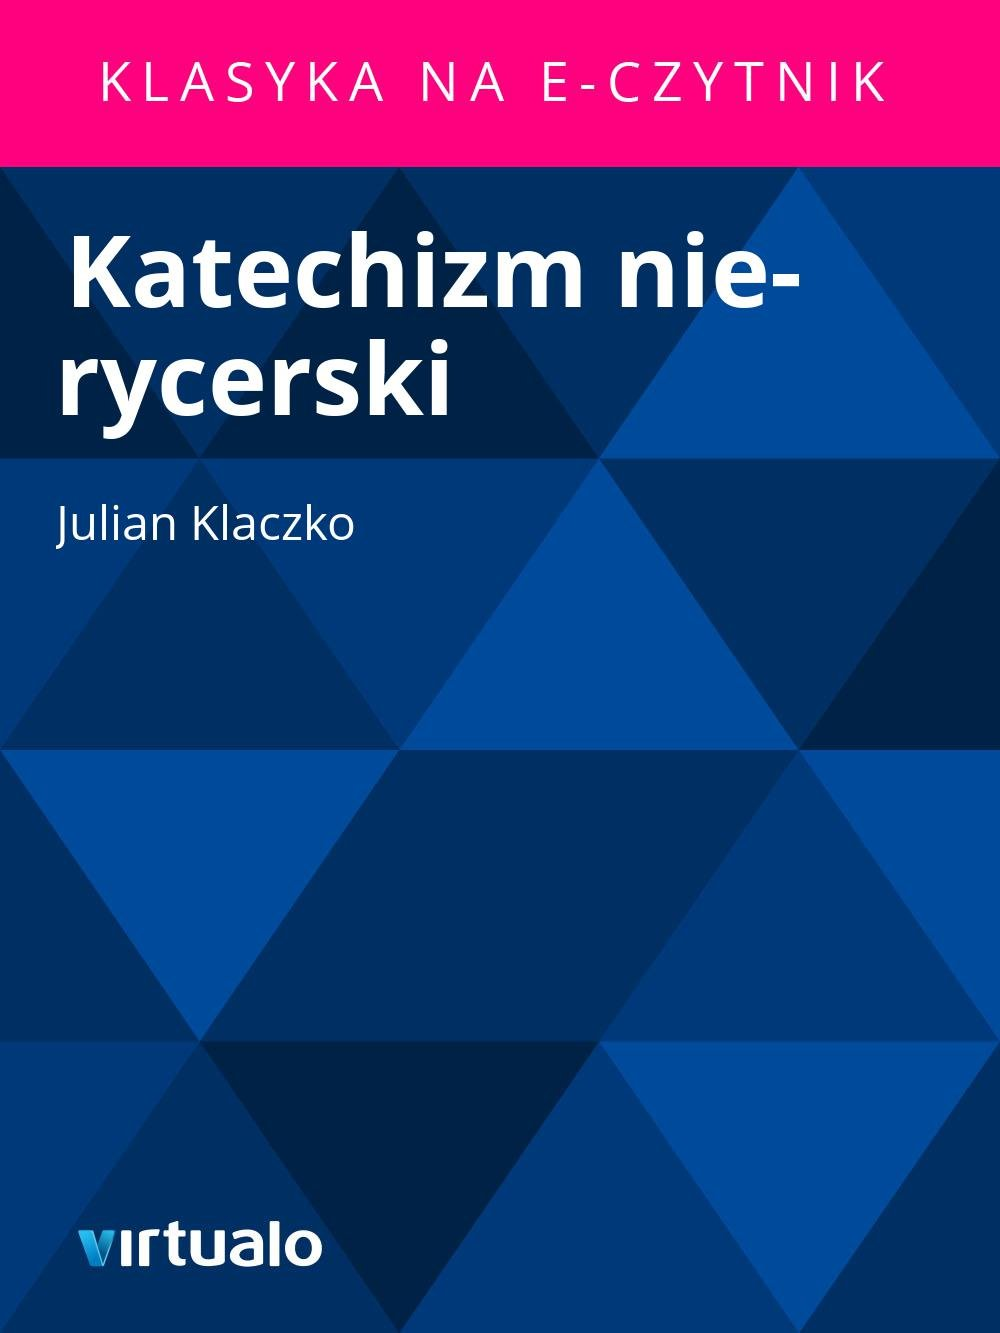 Katechizm nie-rycerski - Ebook (Książka EPUB) do pobrania w formacie EPUB